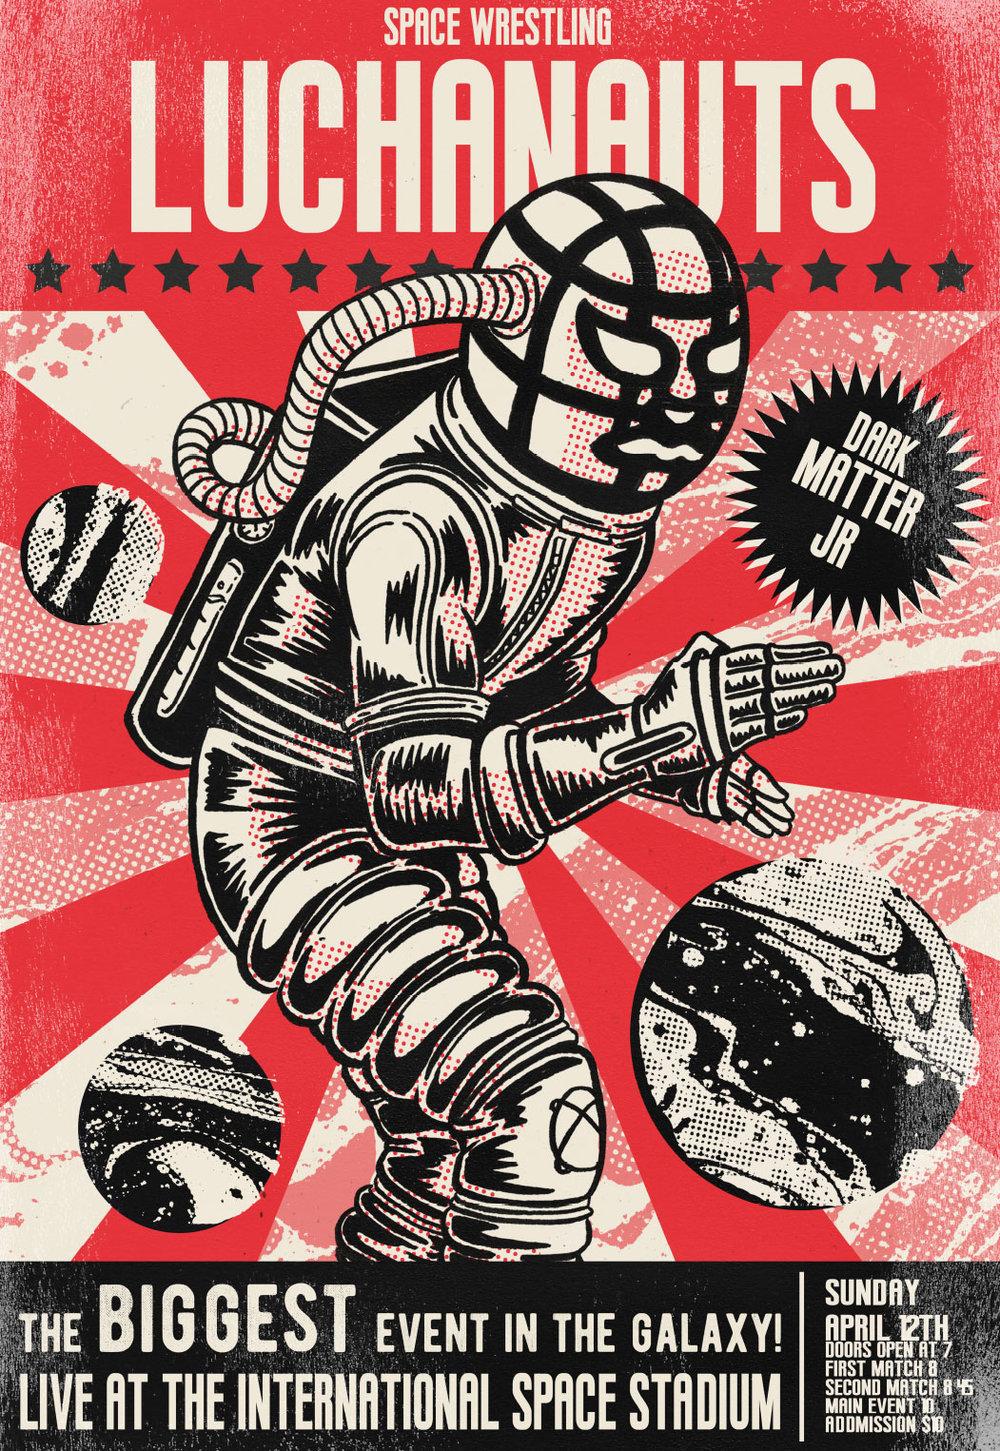 Space Wrestling